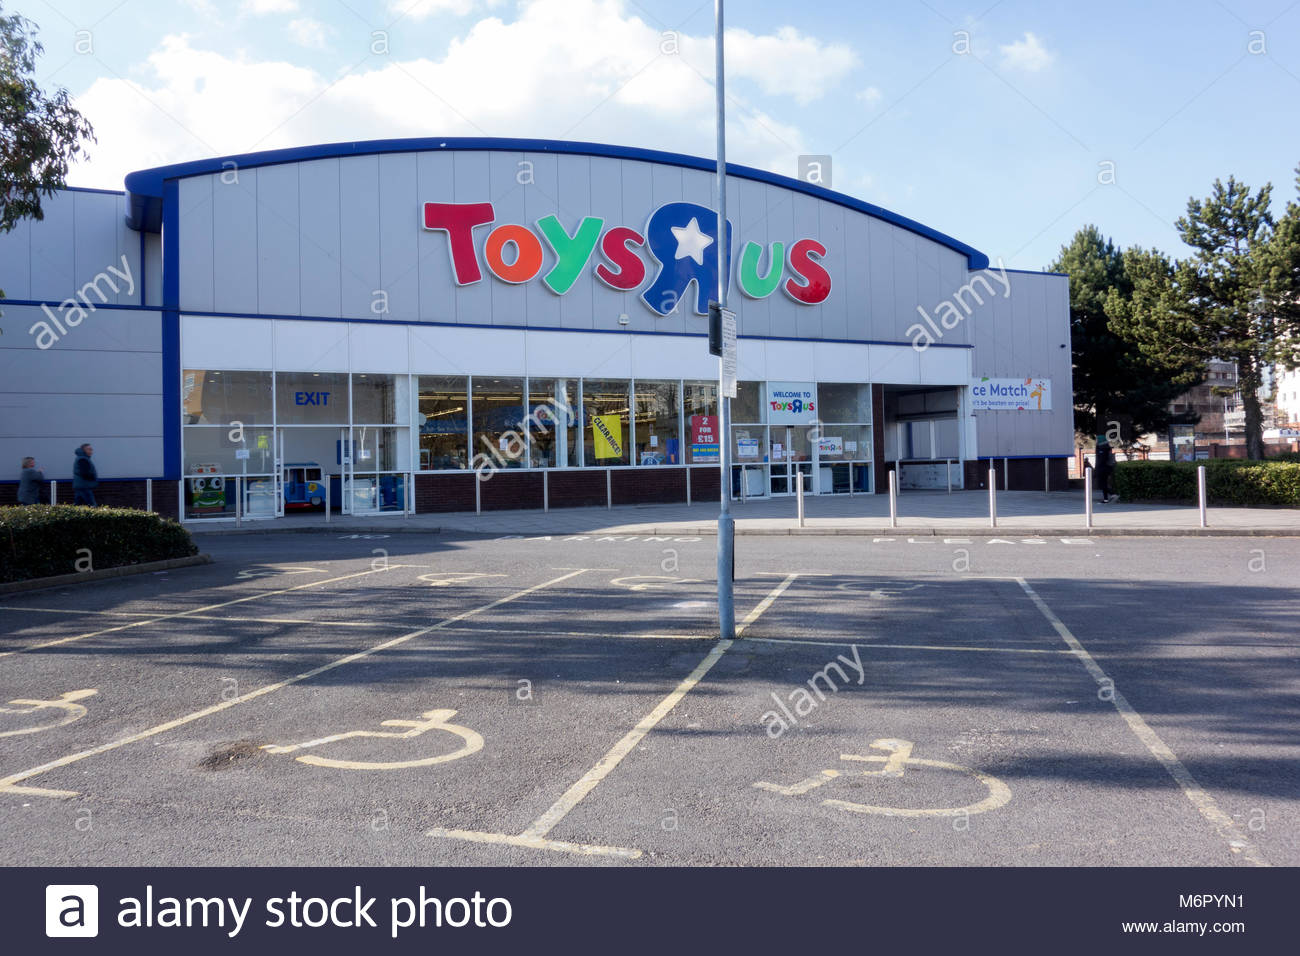 Toys R Us Uk Stock Photos Amp Toys R Us Uk Stock Images Alamy